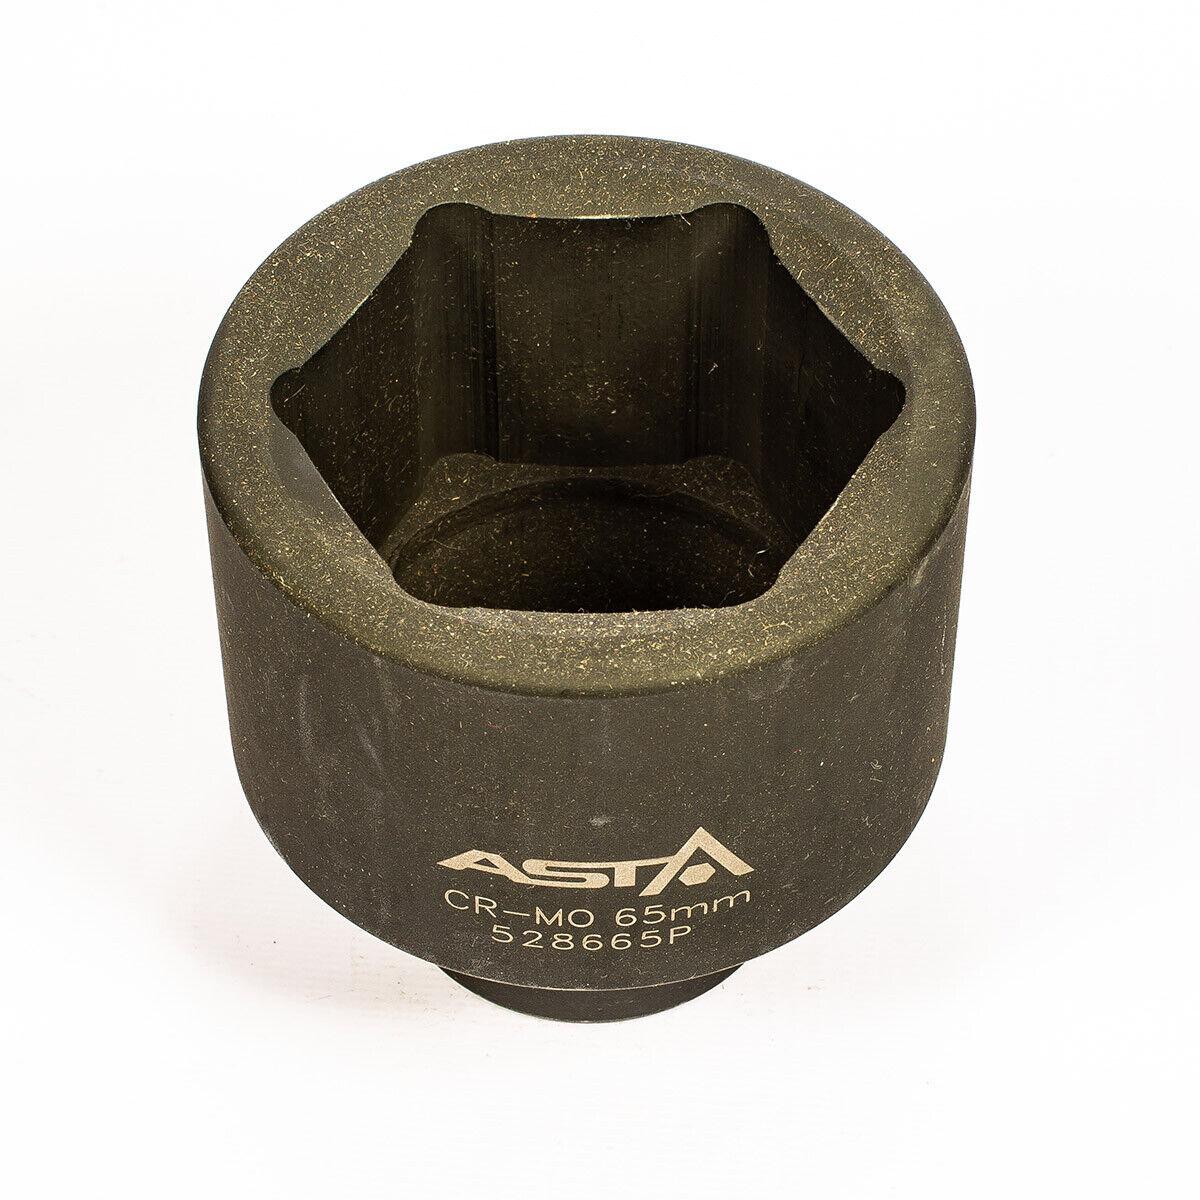 "528630P 30mm Metric 1/"" Dr Short Impact Socket 6 Point 6PT Heavy Duty 60mm Long"